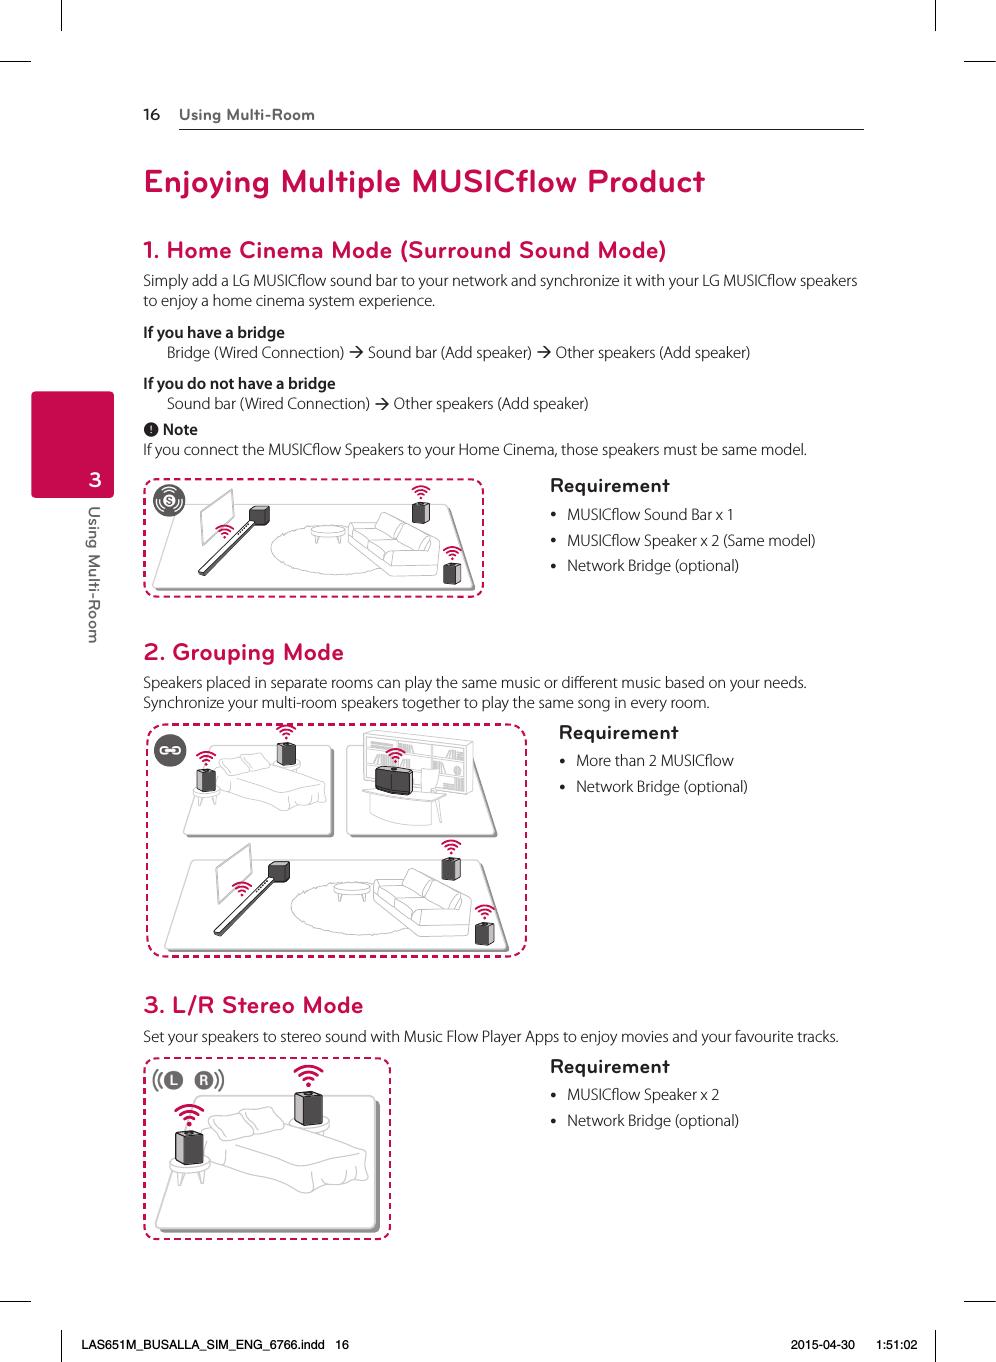 LG LAS851M User Manual Guide LAS651M BUSALLA SIM MFL68646766